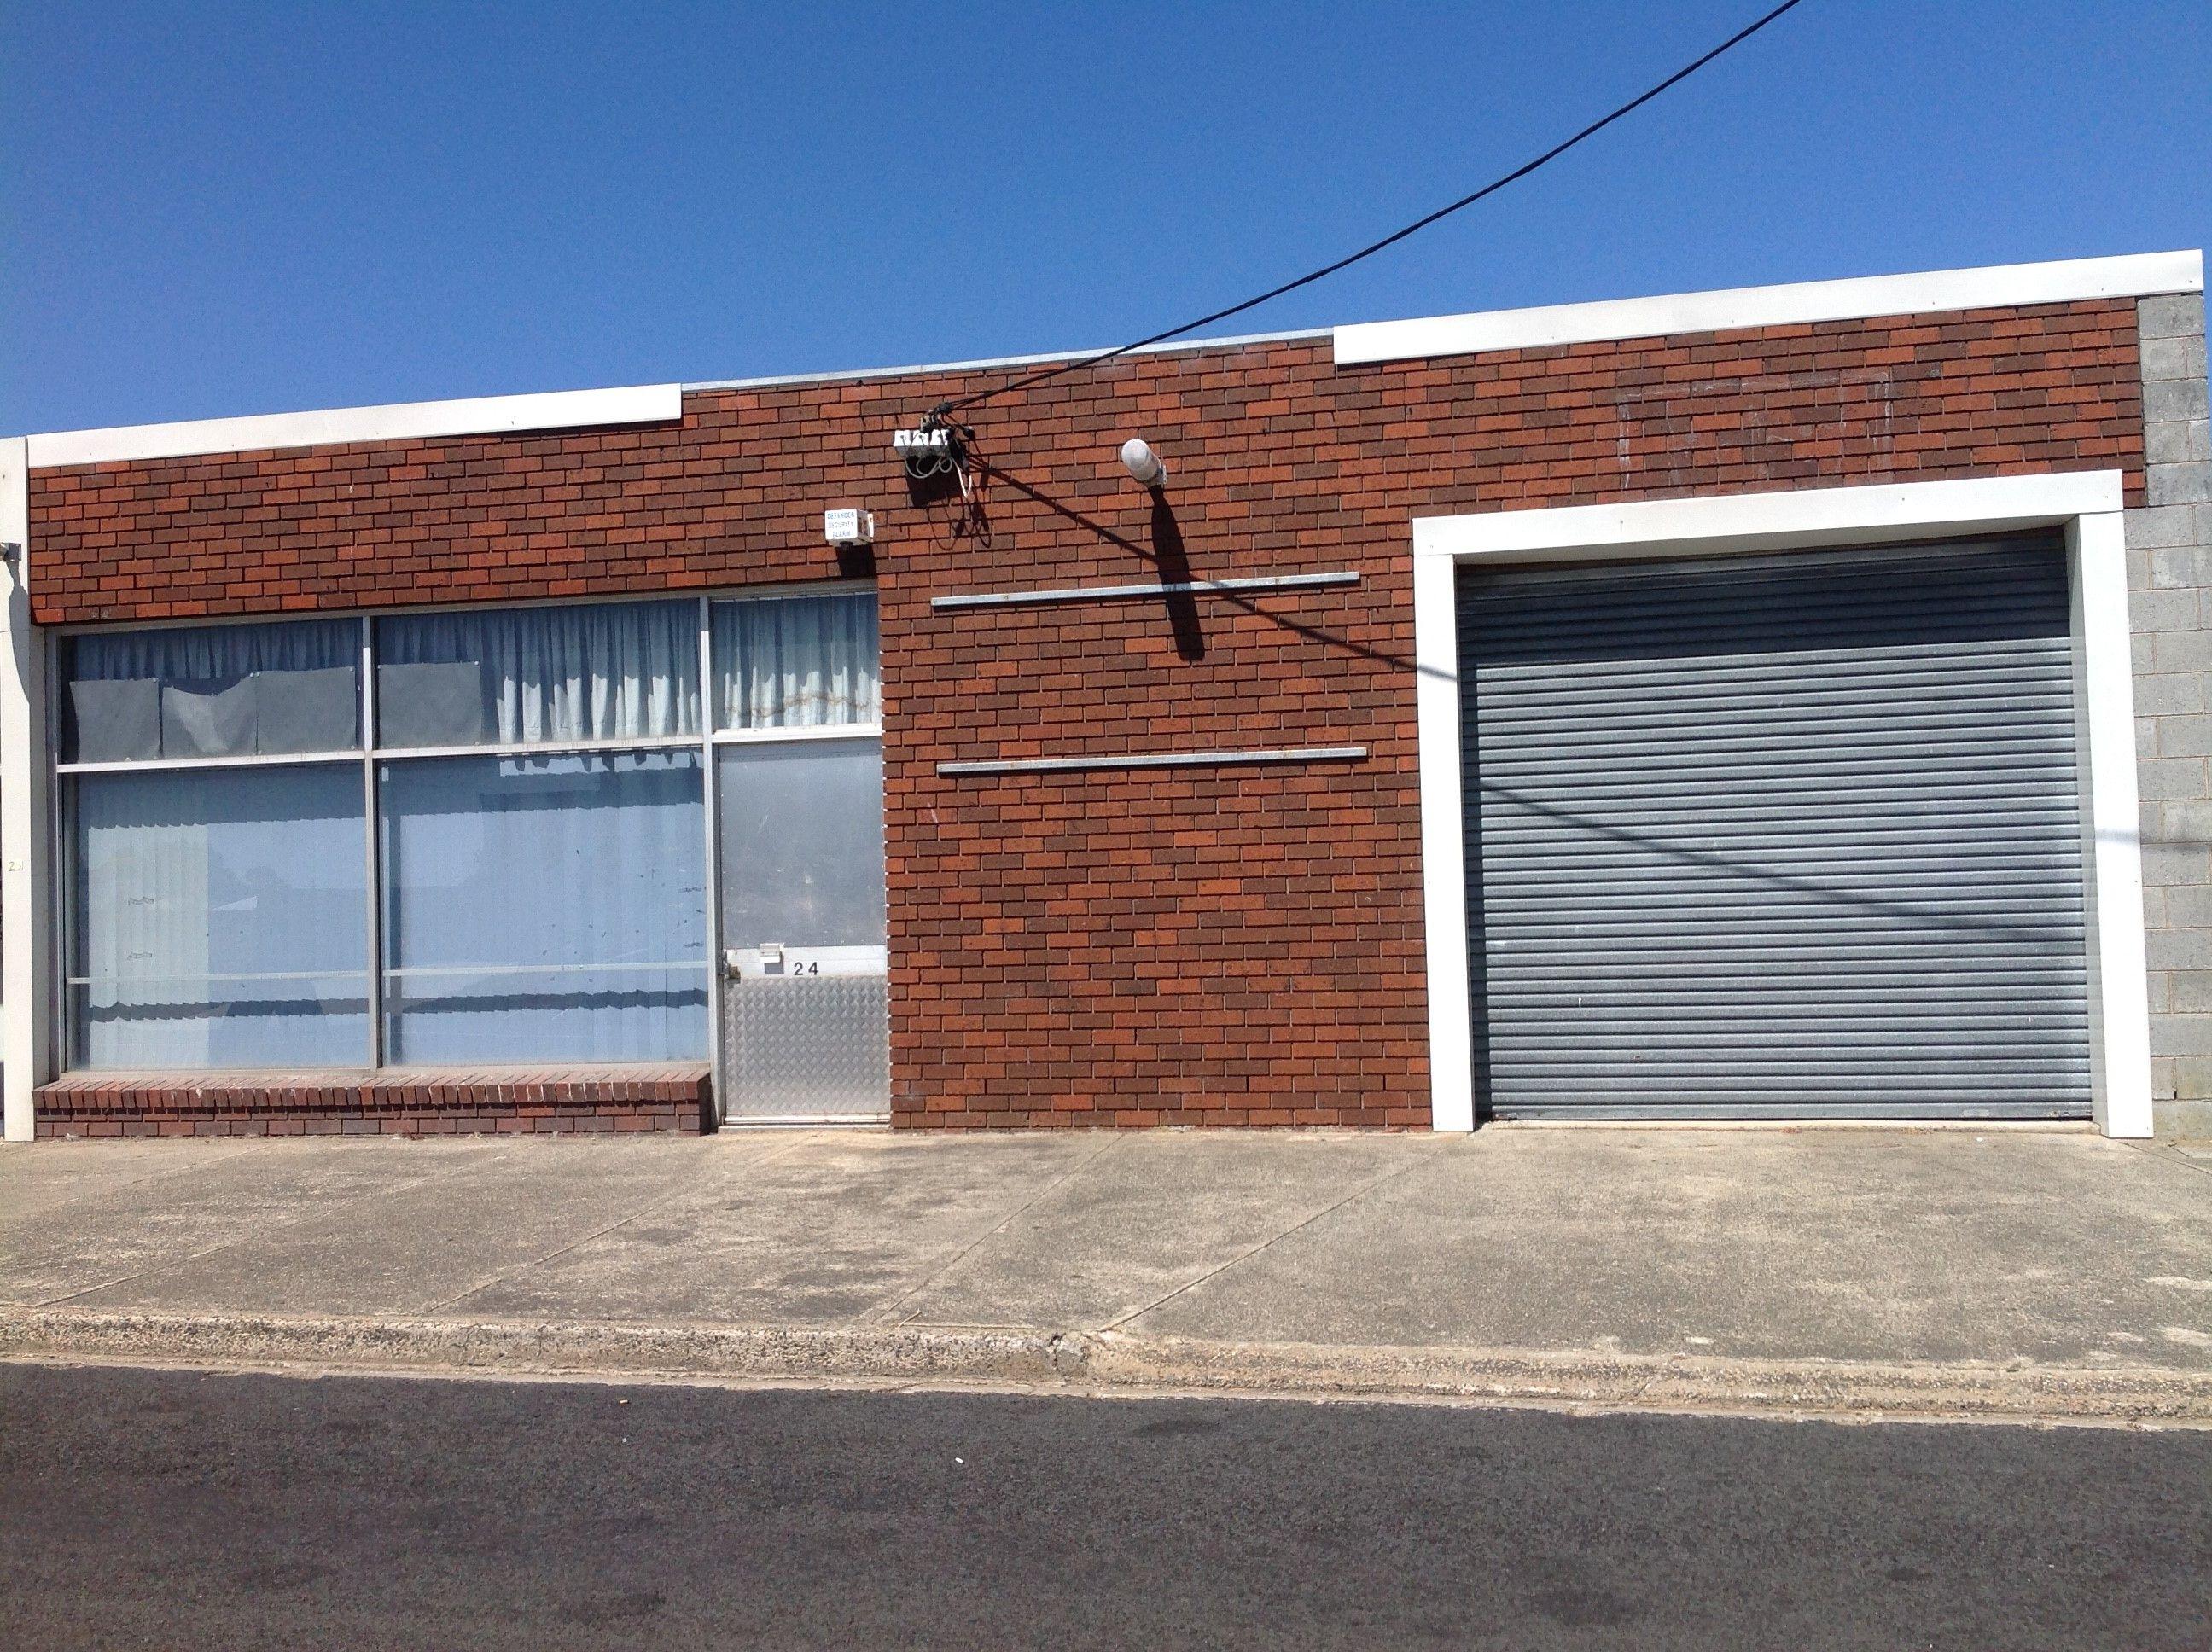 26 Thomas Street East Devonport & Sold property: $180000 for 26 Thomas Street - East Devonport  TAS 7310